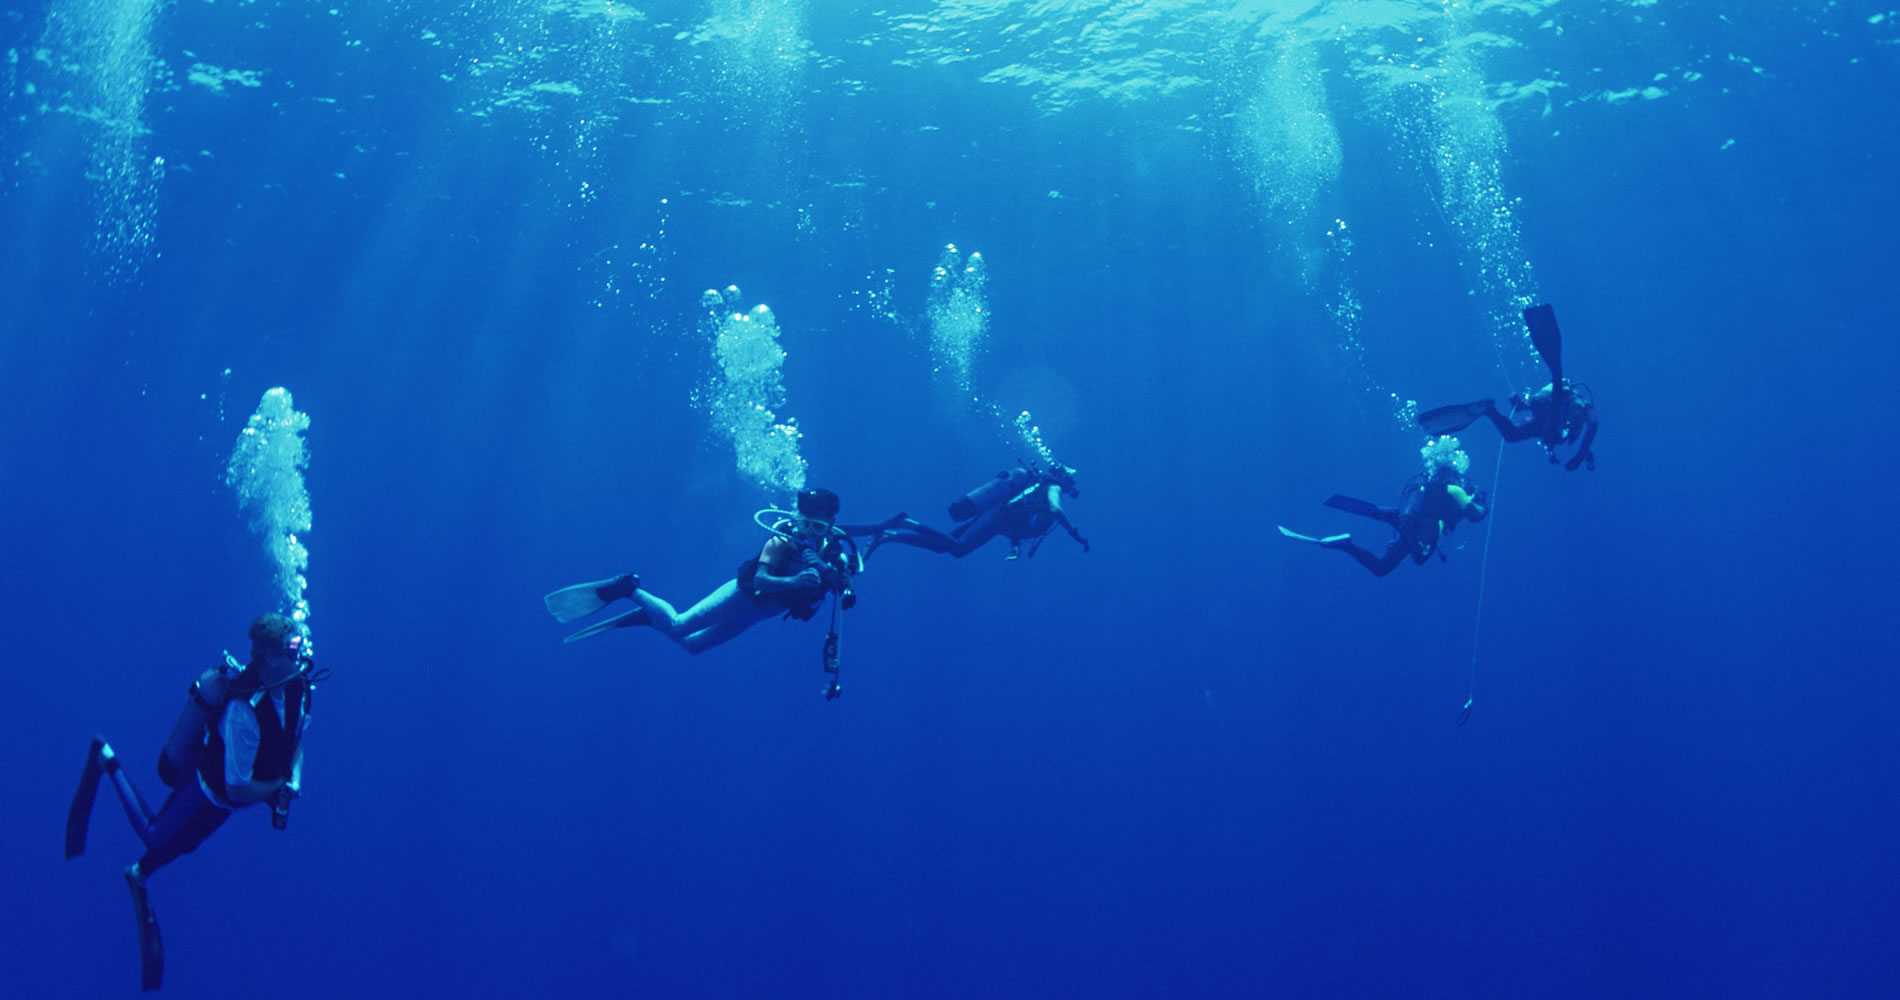 High Resolution Wallpaper | Diving 1900x1000 px